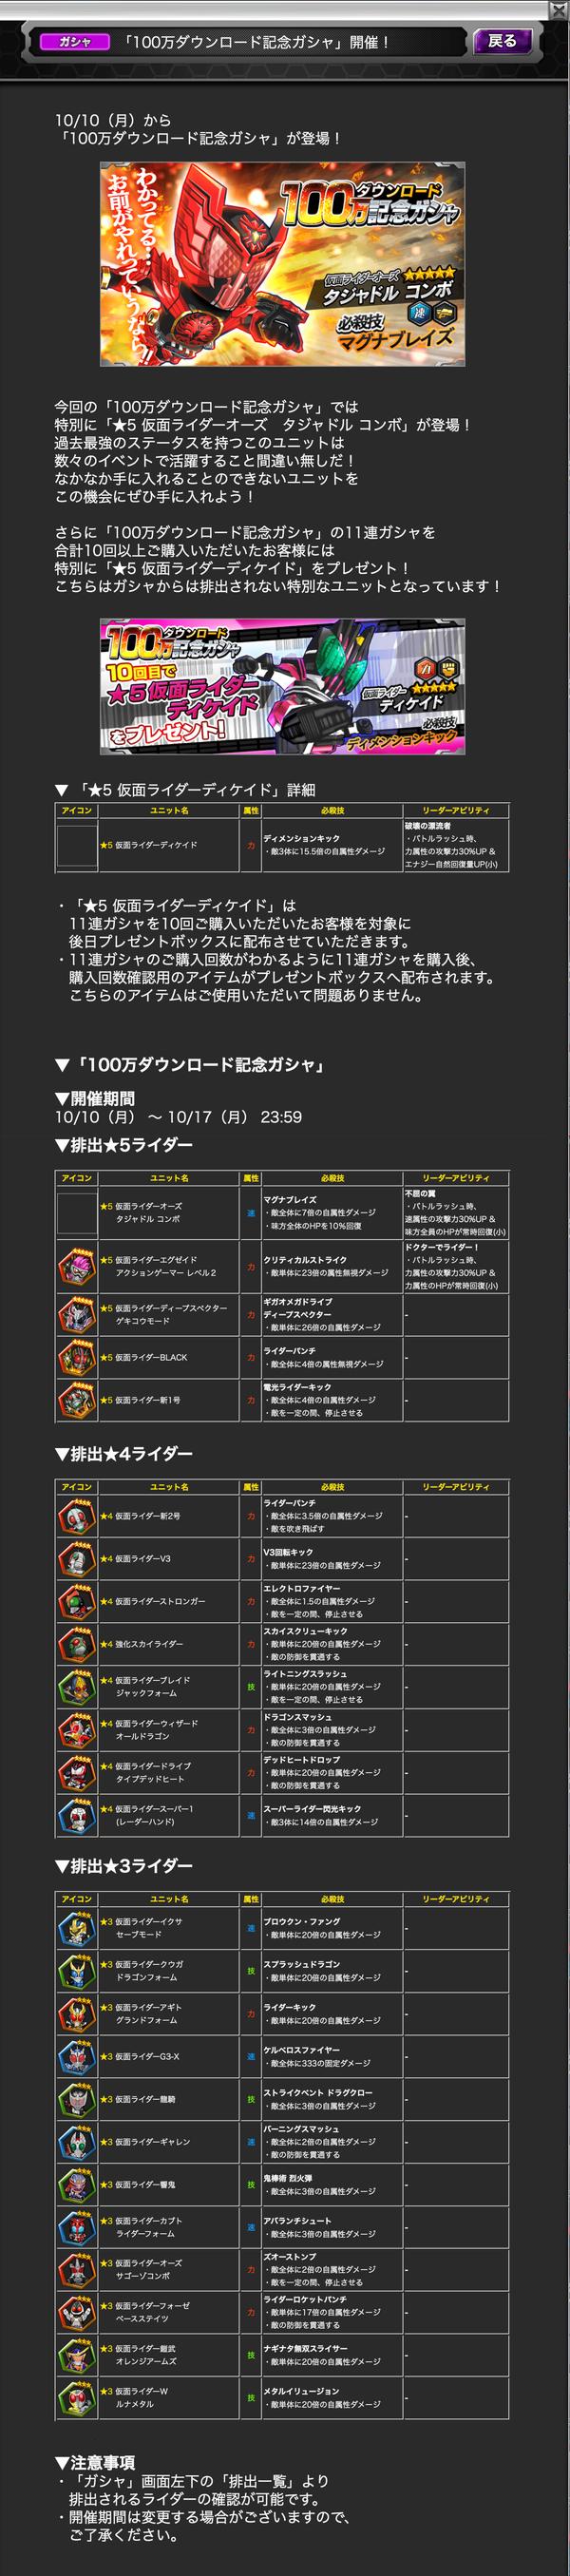 f:id:ich-ichi:20161011123614p:plain